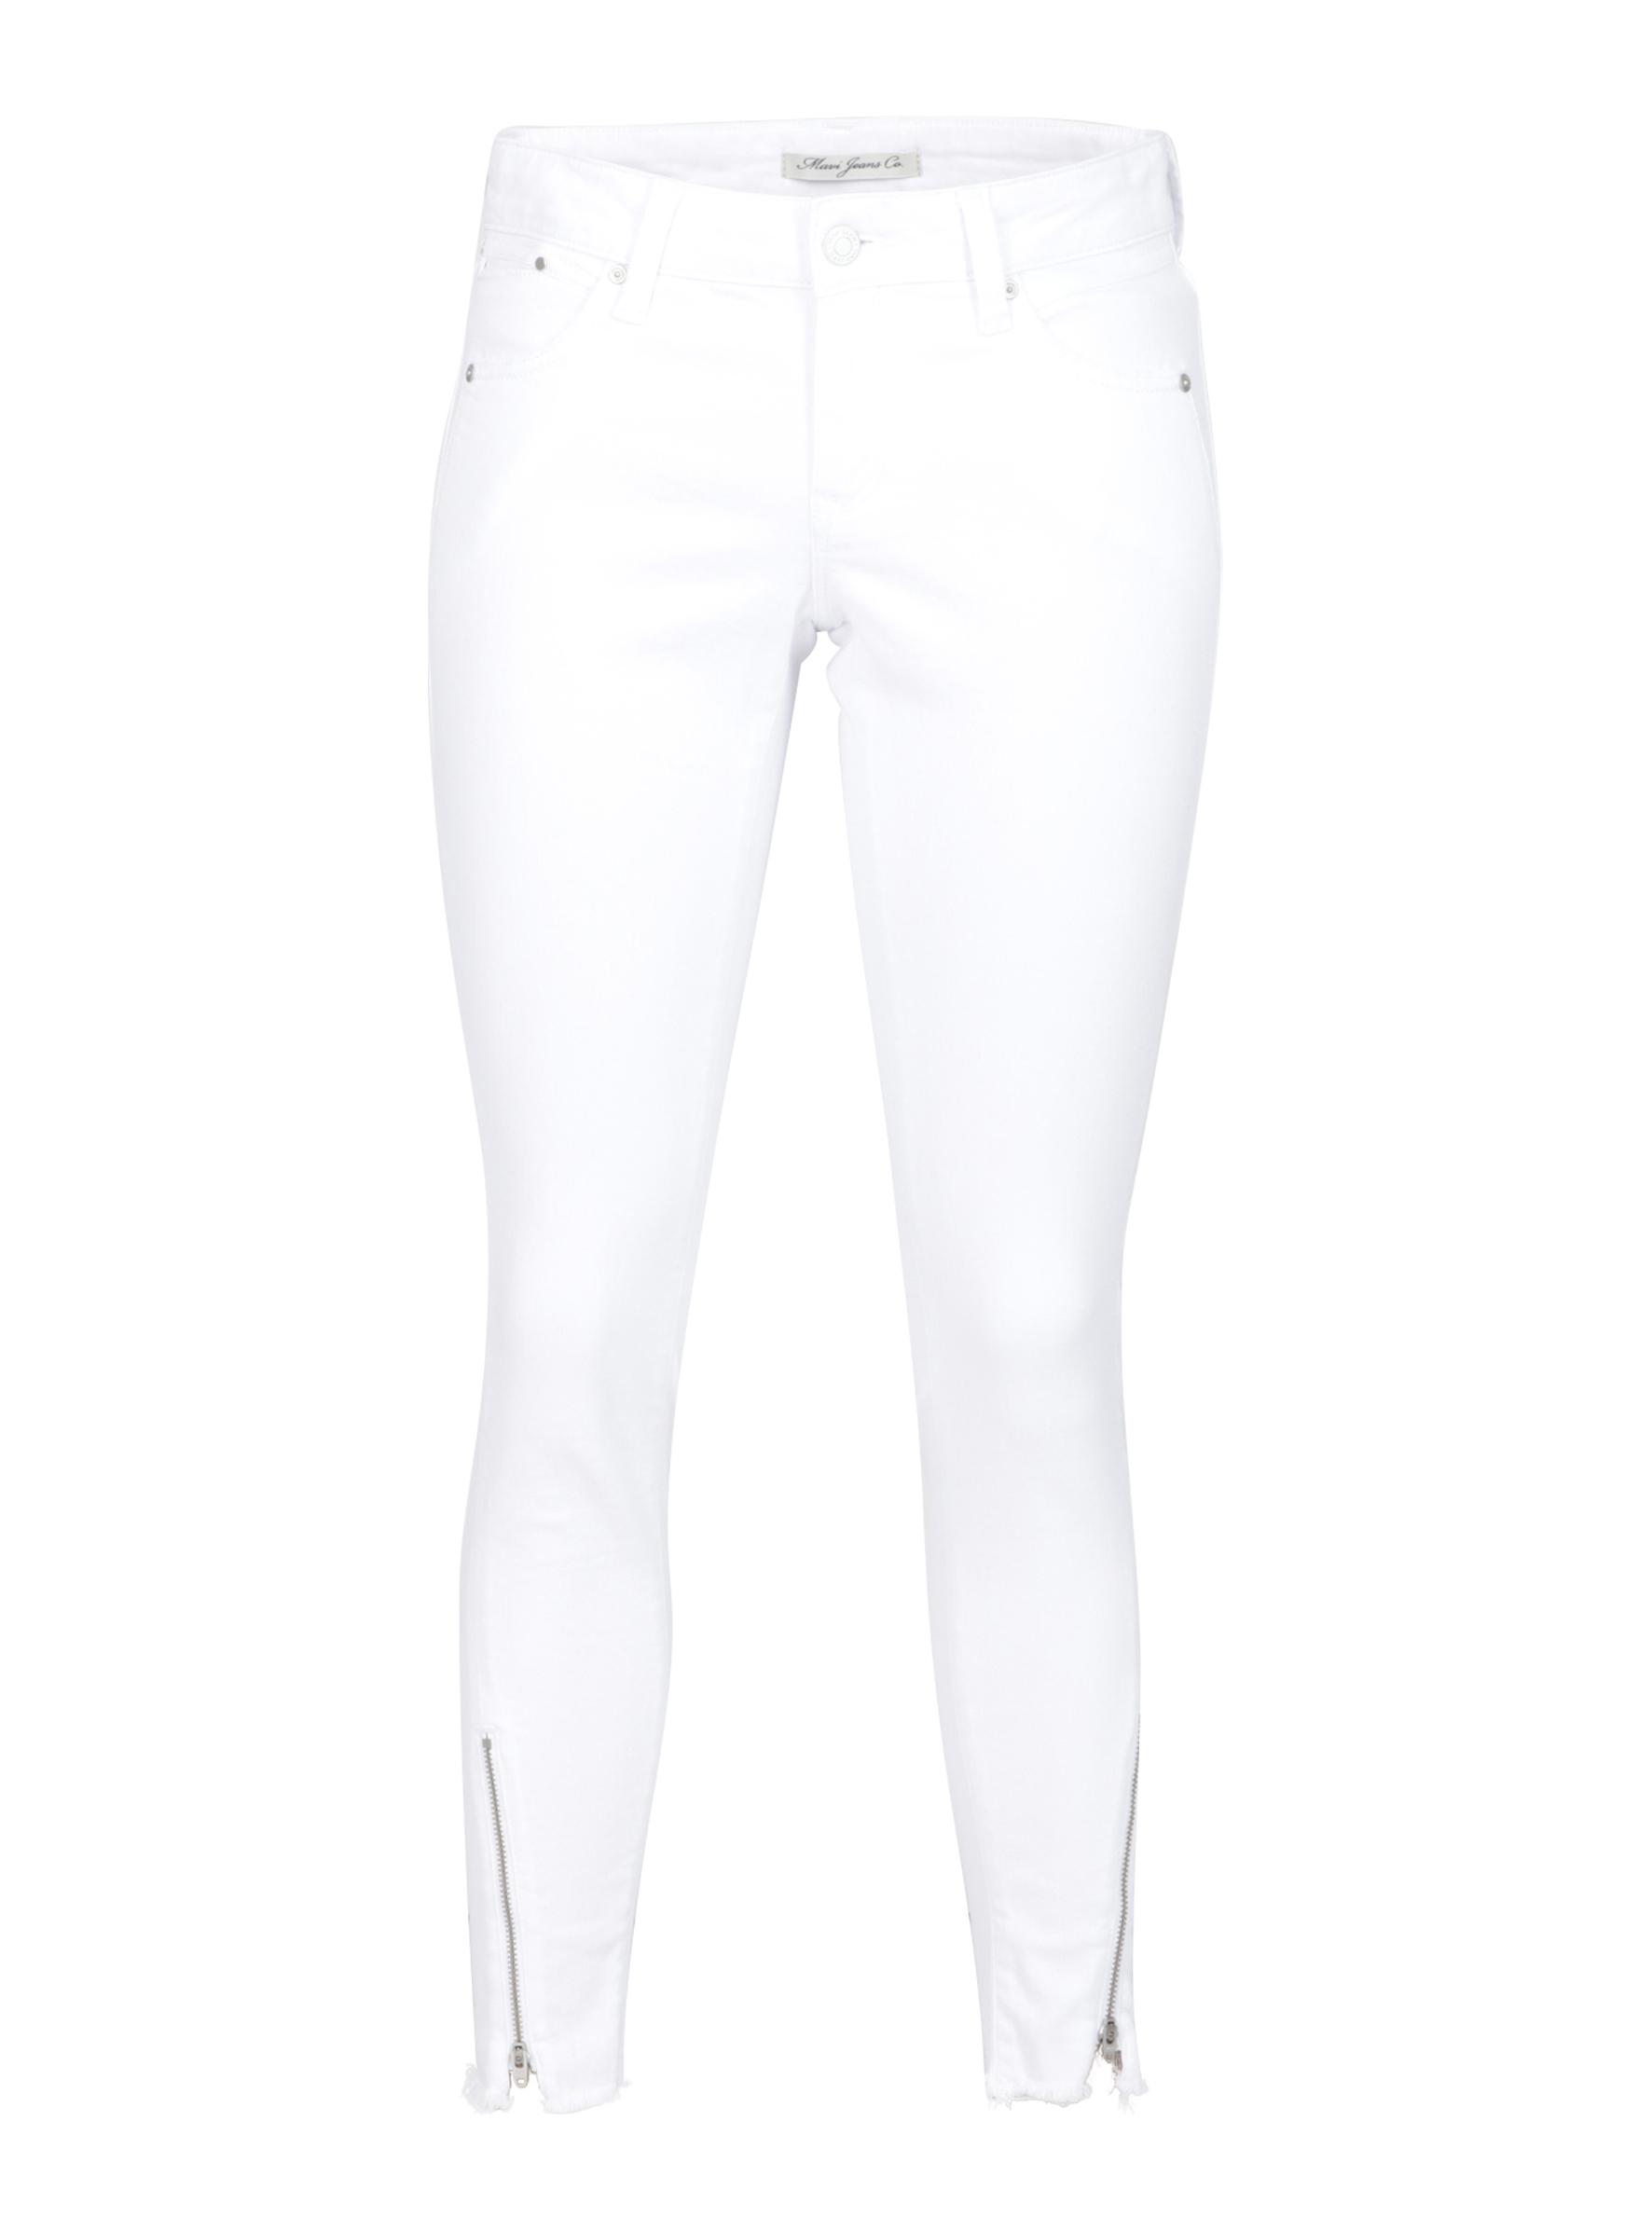 Serenity Super Skinny Jeans in weiß bei Mavi Jeans